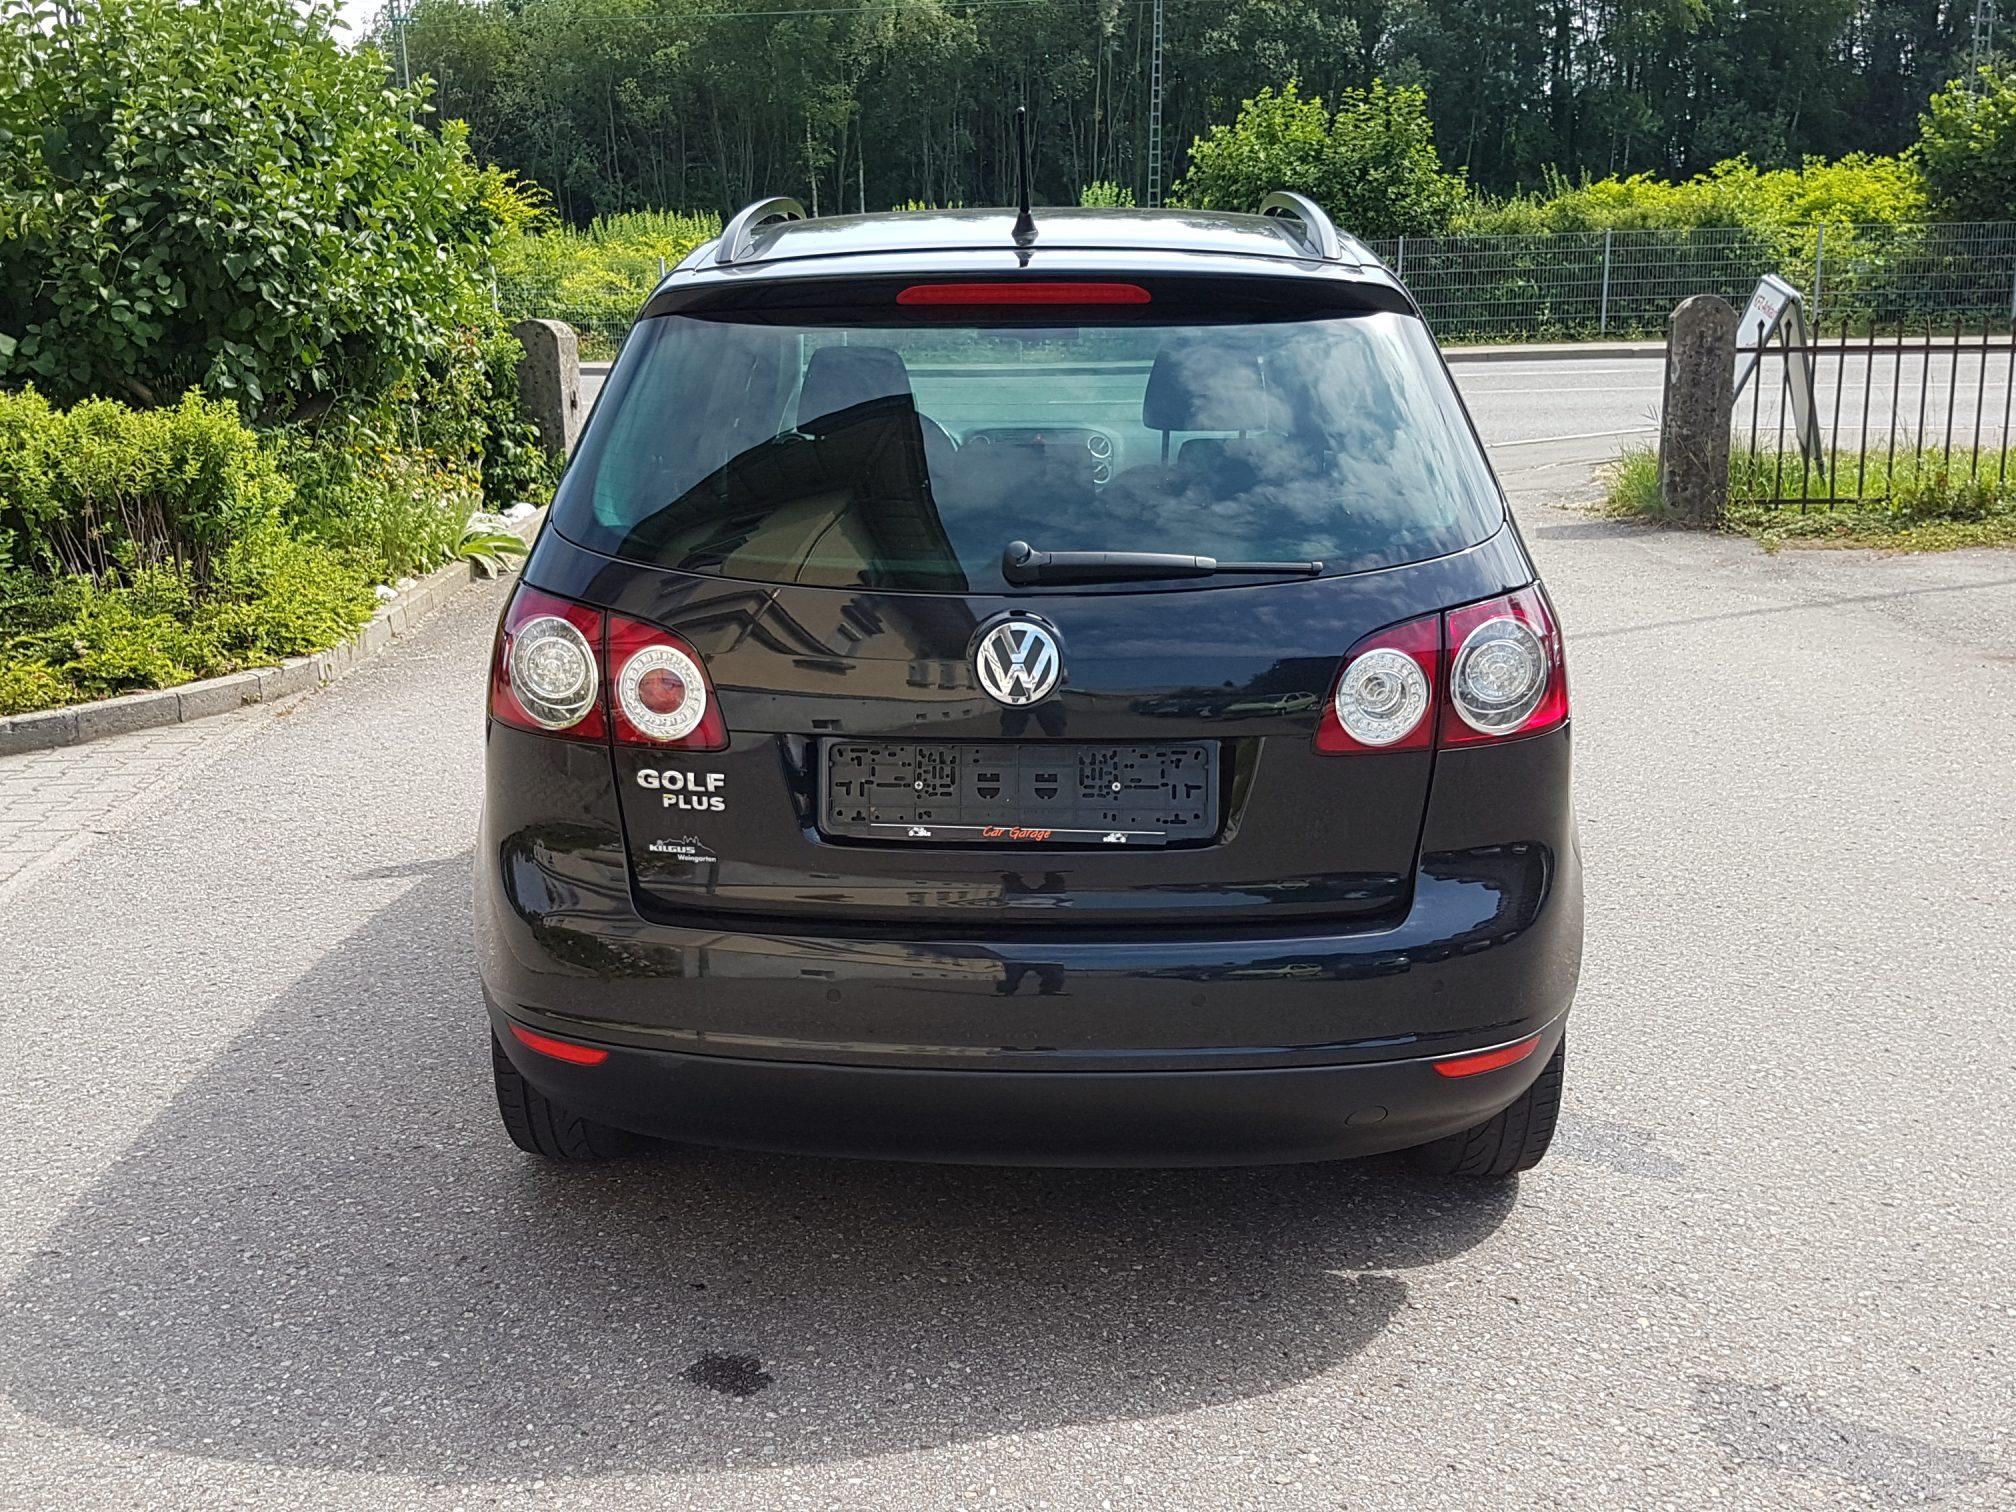 VWGolf V Plus 1.4